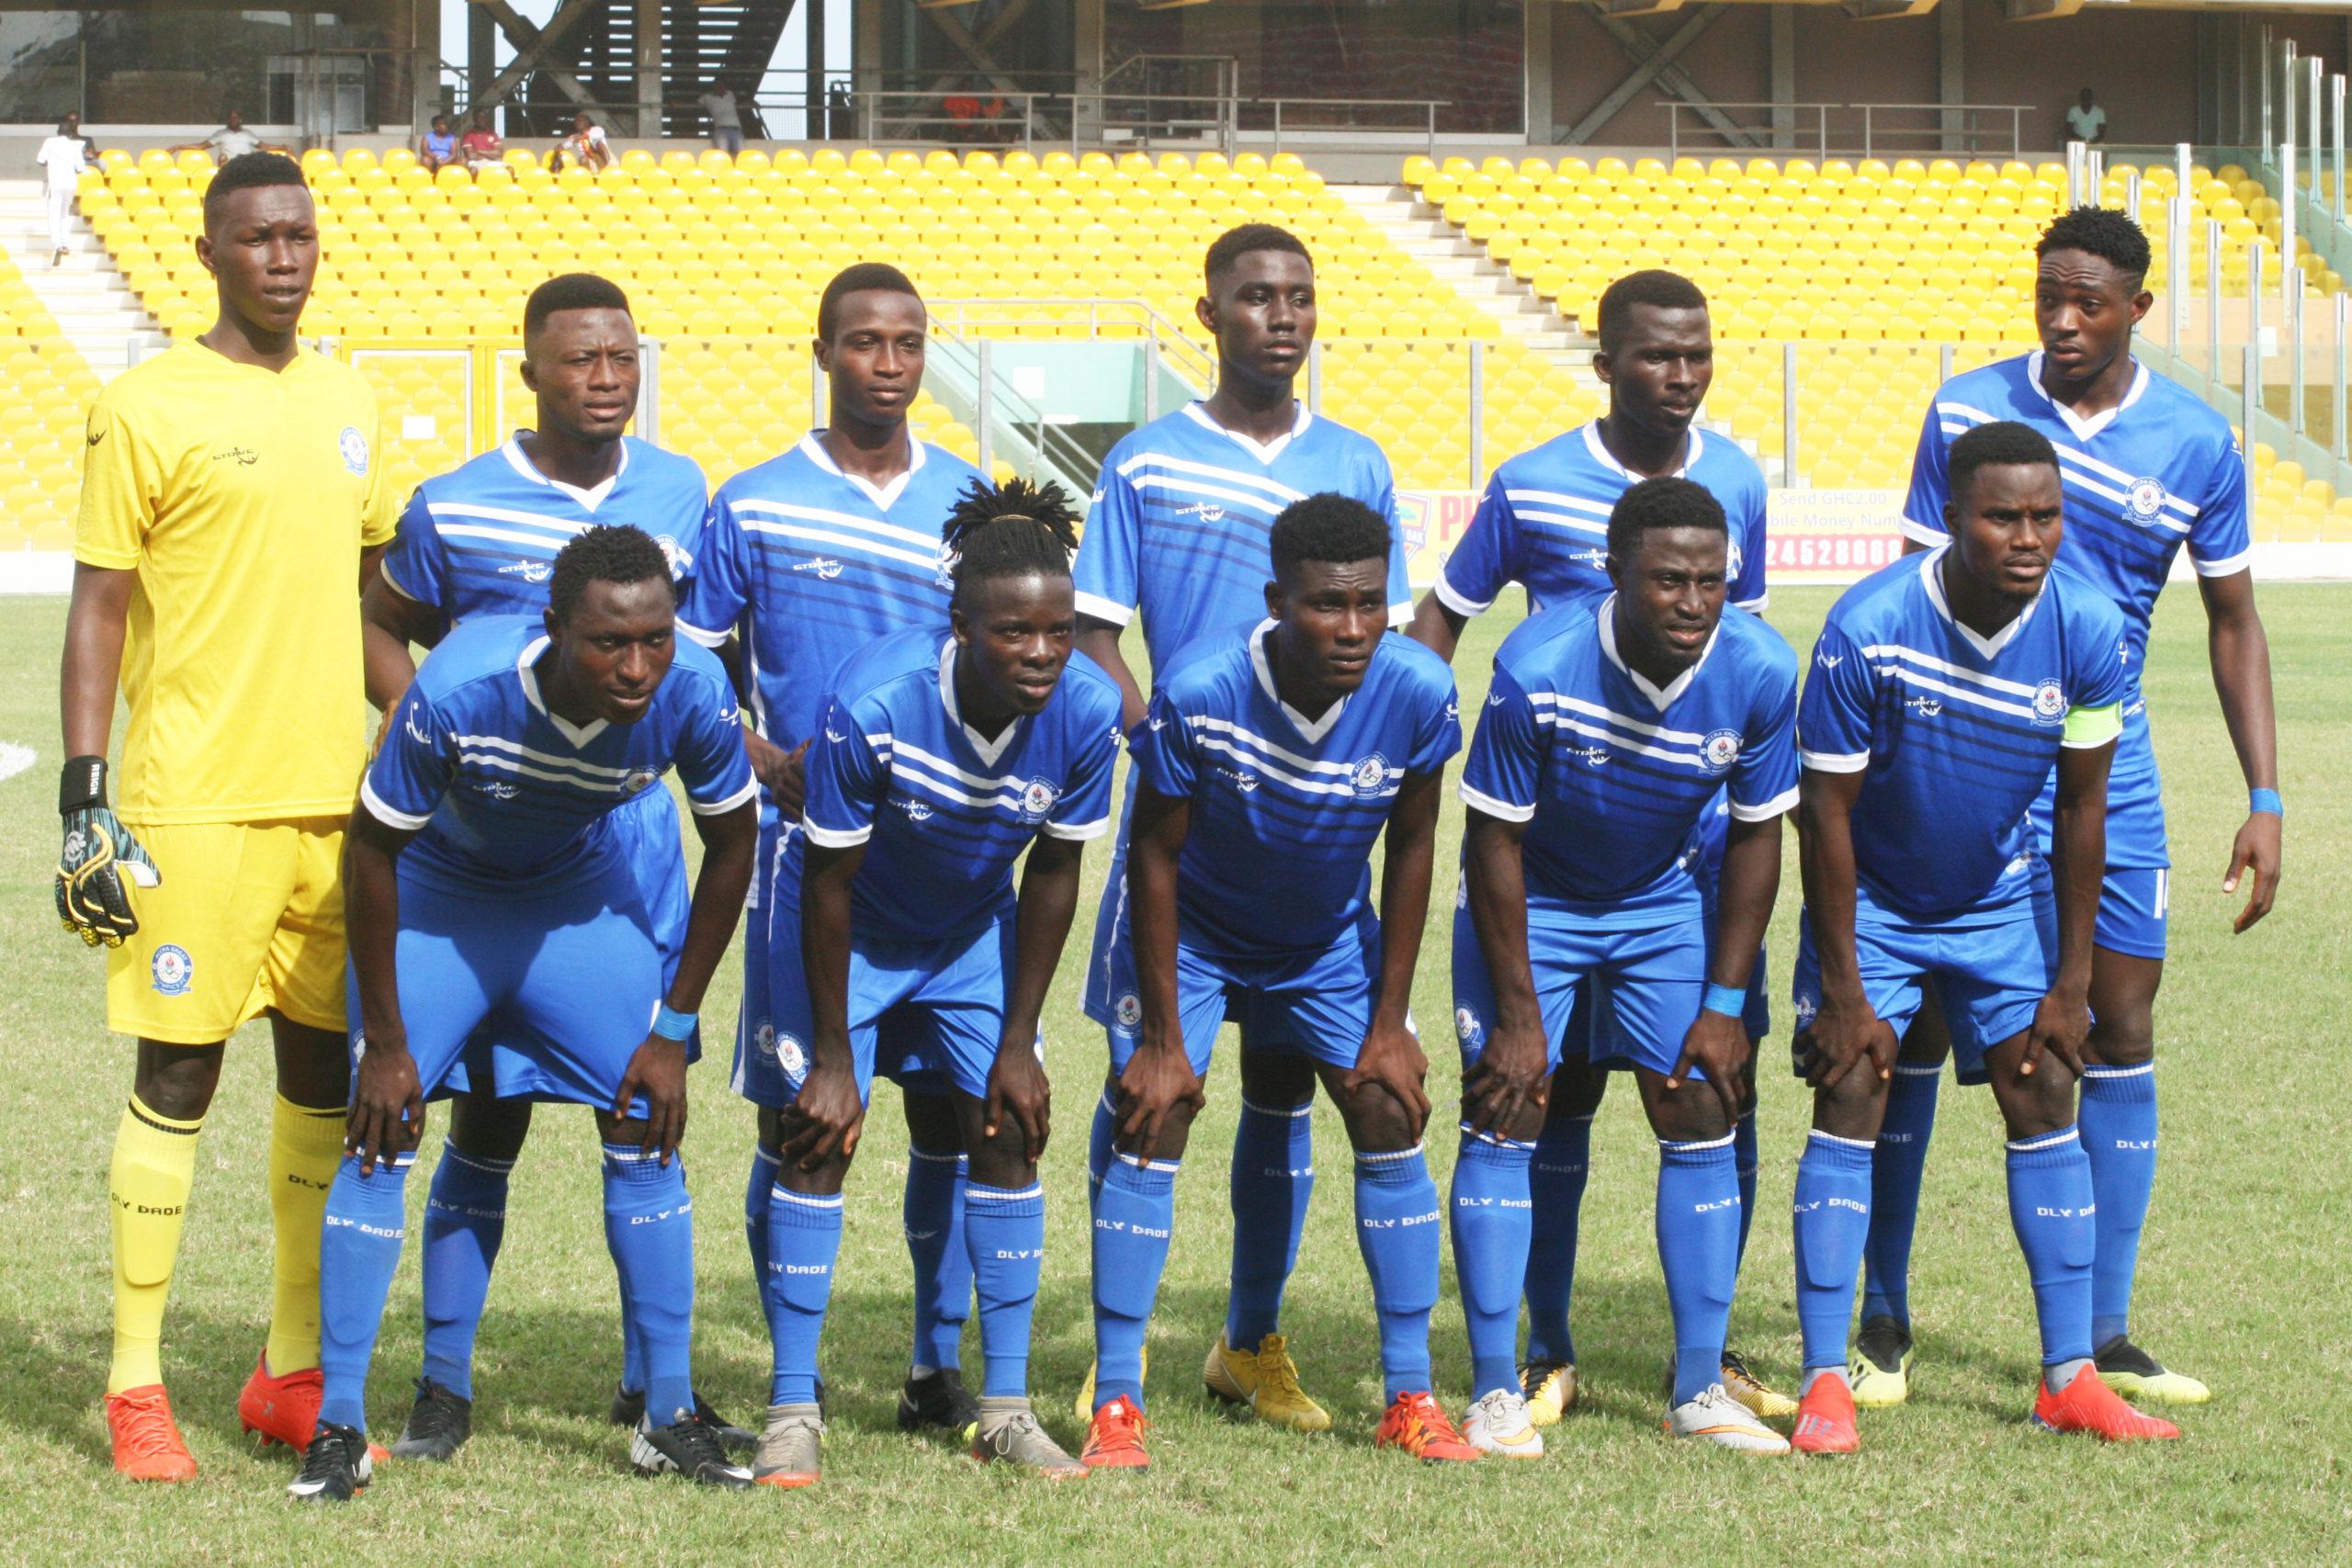 Ghana Premier League matchday 13 report: Olympics earn 2-0 victory over Dwarfs